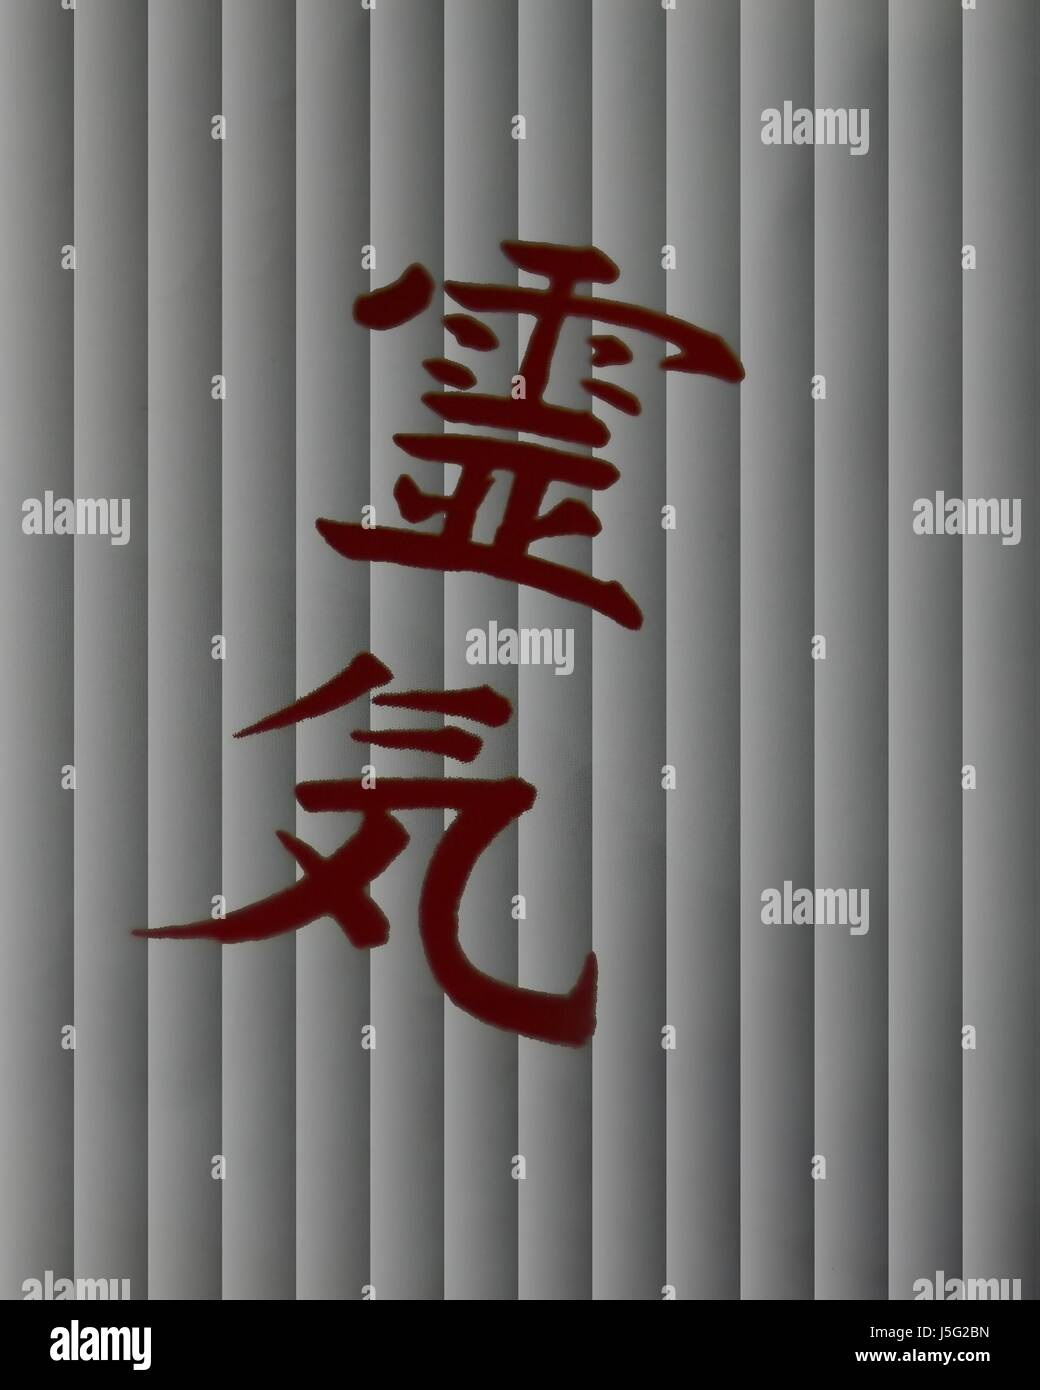 Usui reiki stock photos usui reiki stock images alamy reiki symbol in neujapanischer font stock image biocorpaavc Image collections